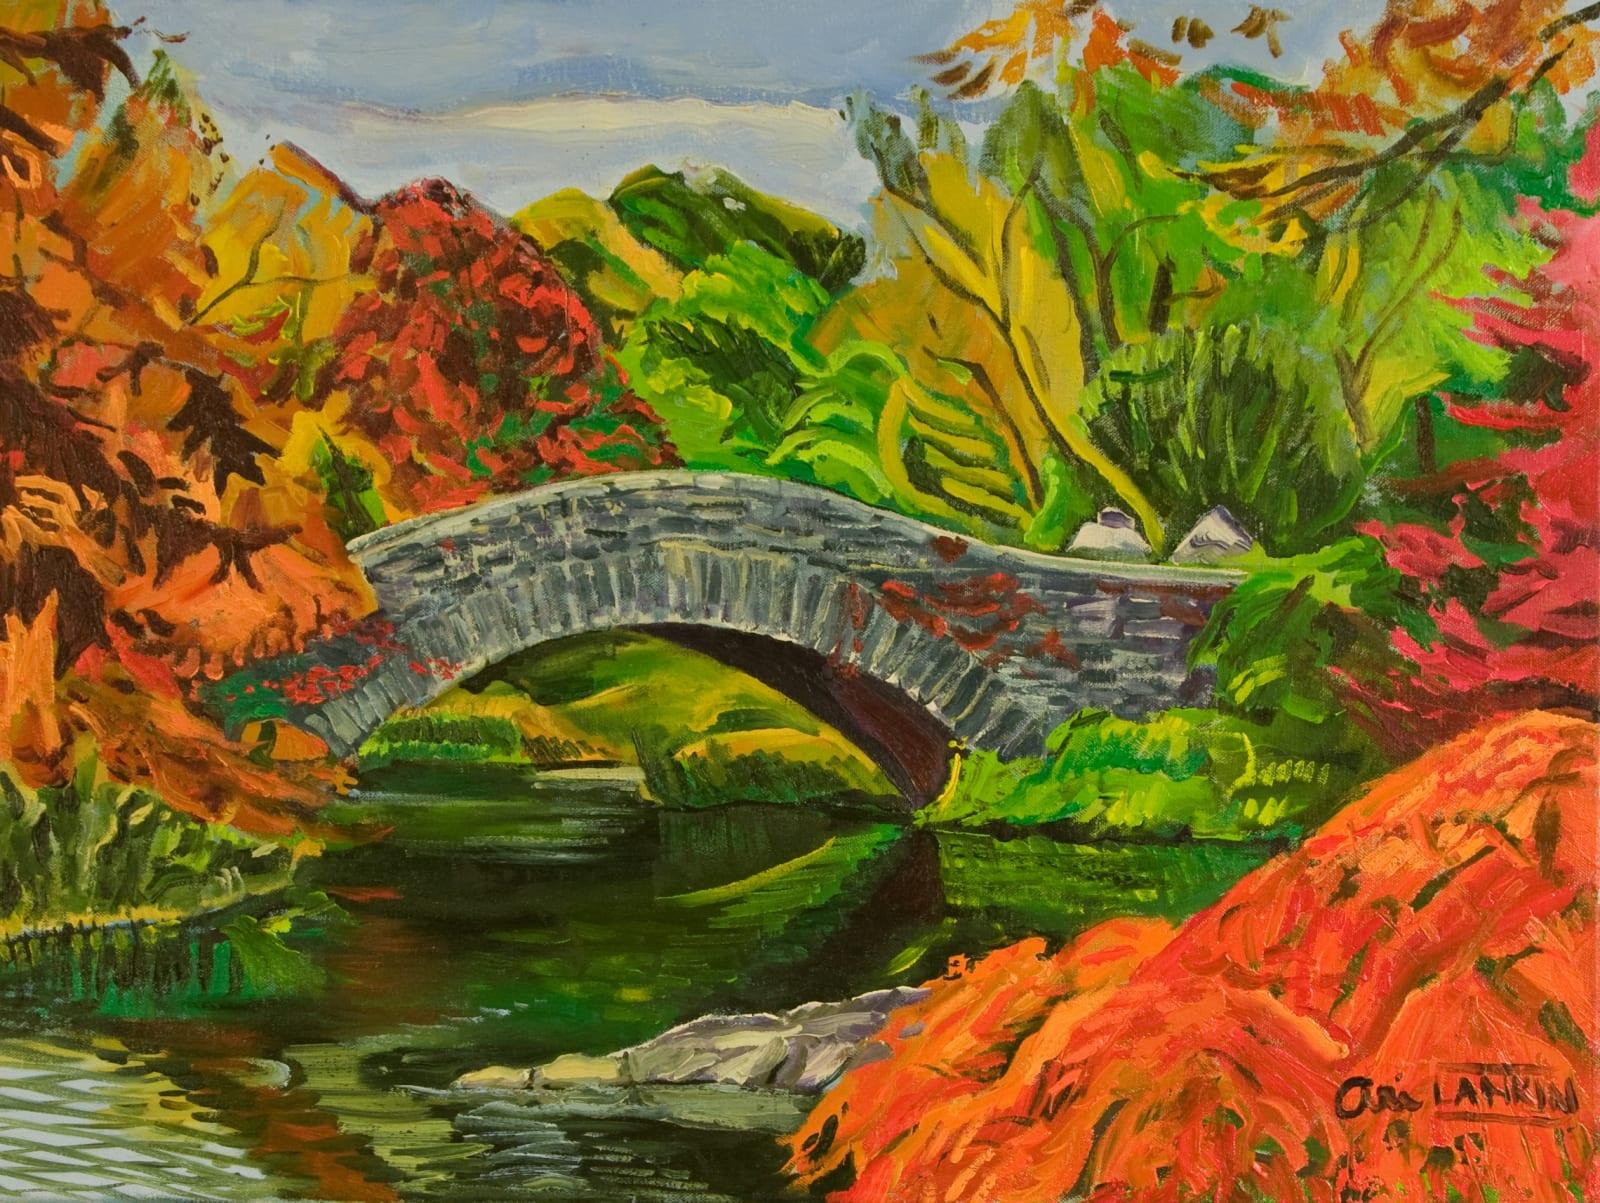 Ari Lankin, Gapstow Bridge, Central Park, 2015